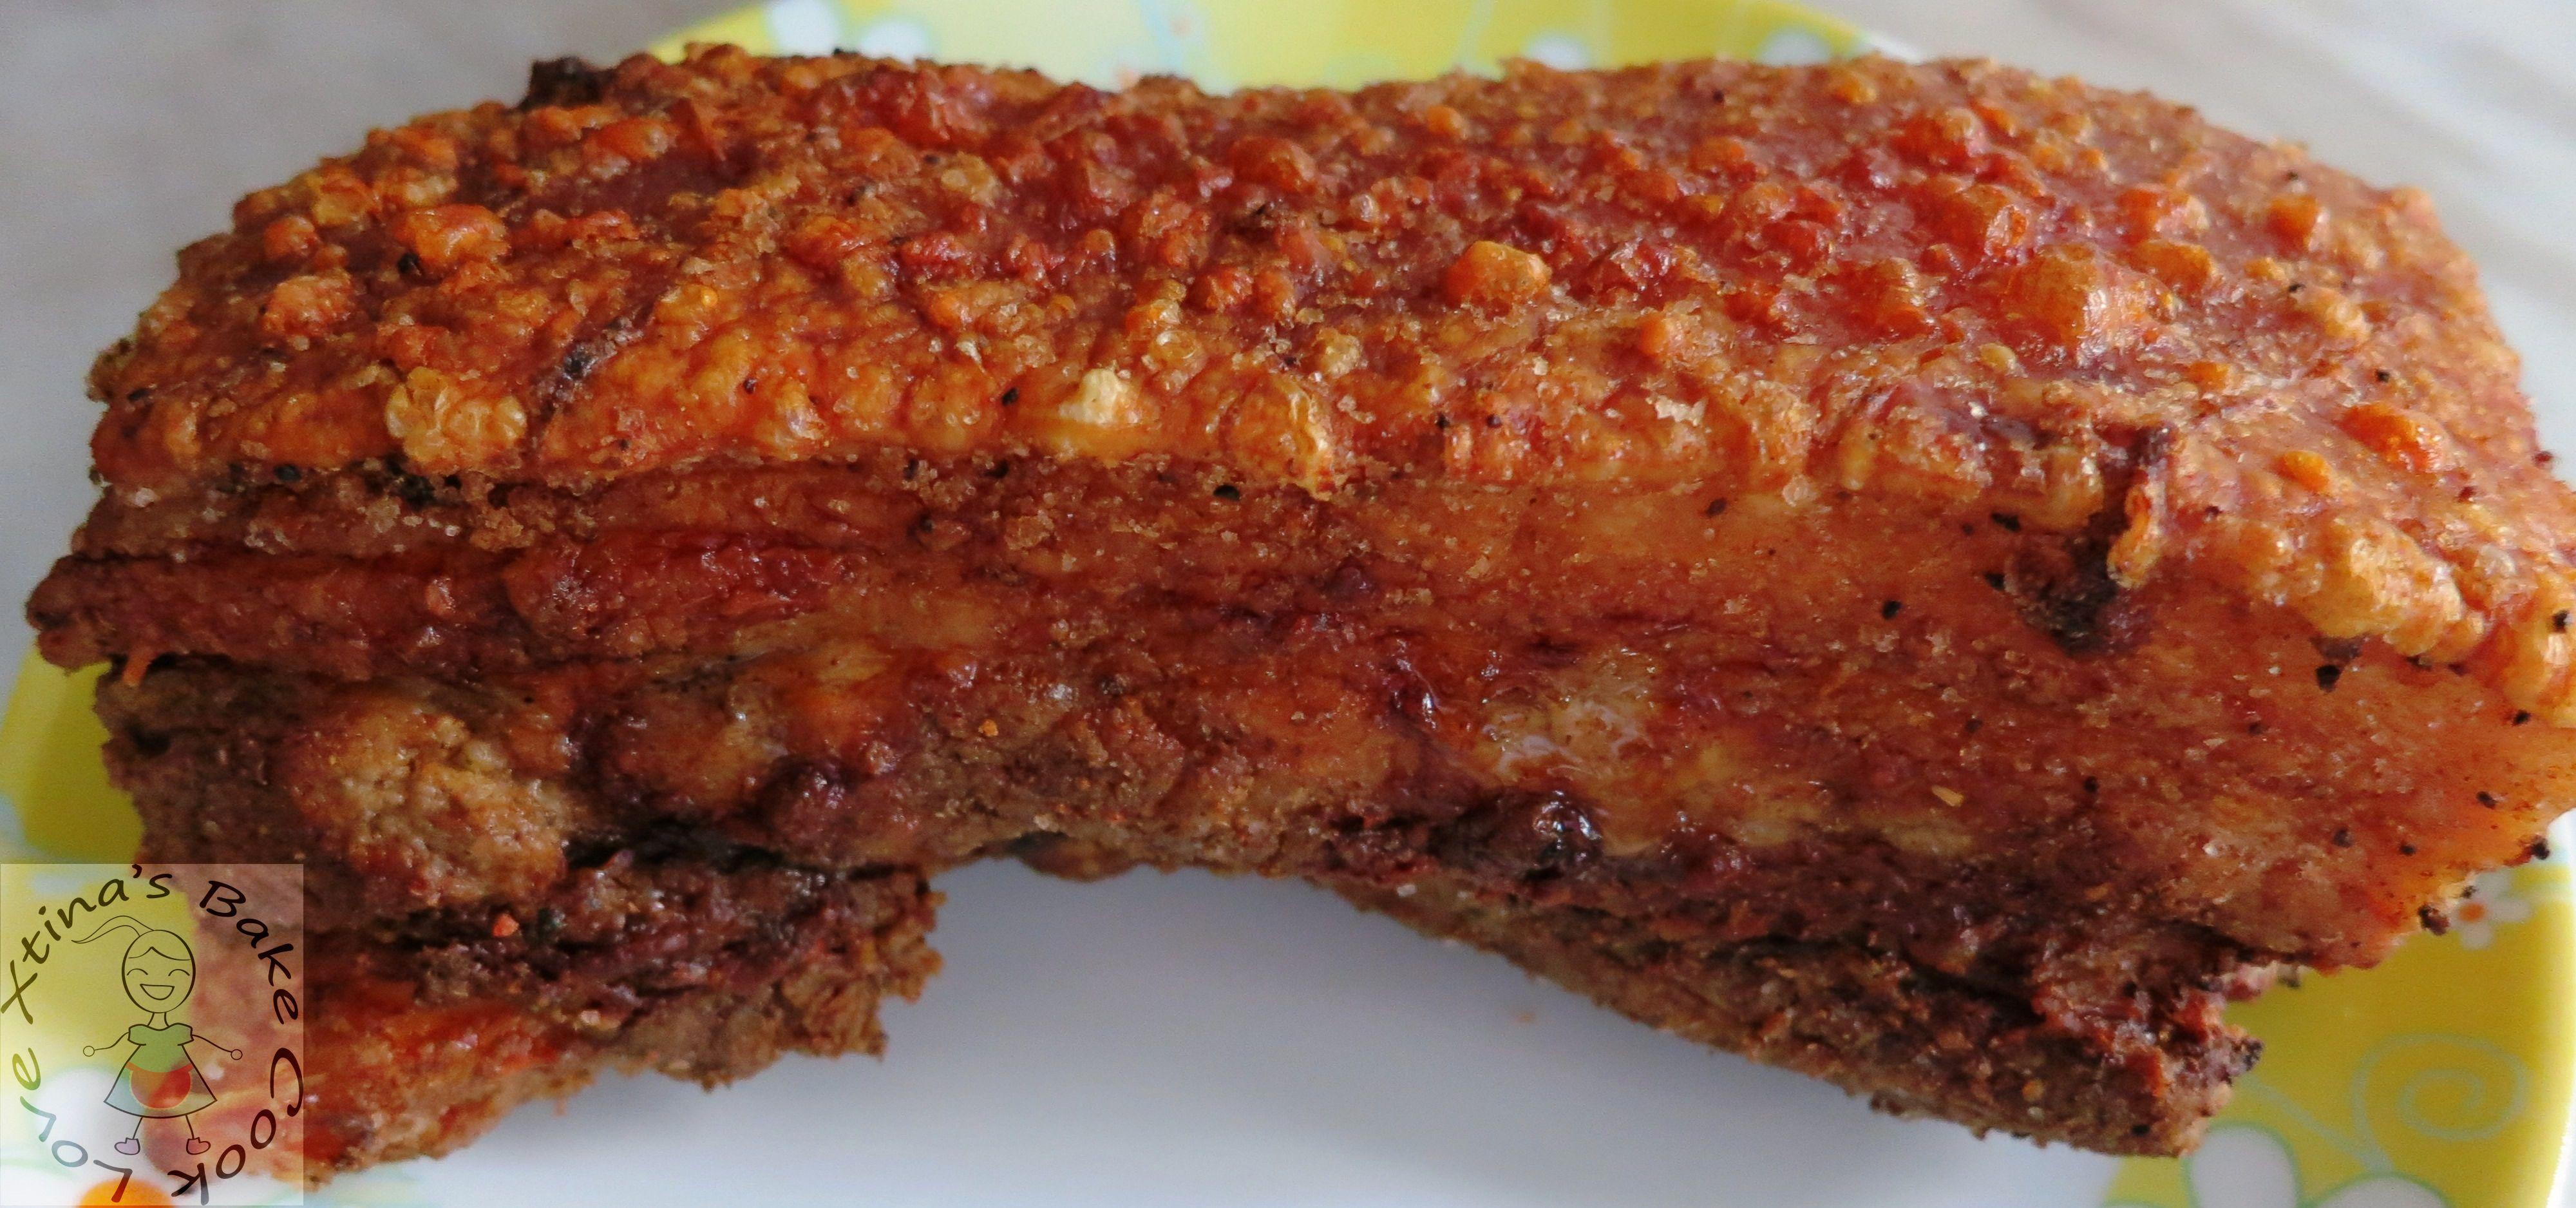 Airfried Crispy Roast Pork 脆皮烧肉 Air fryer recipes pork